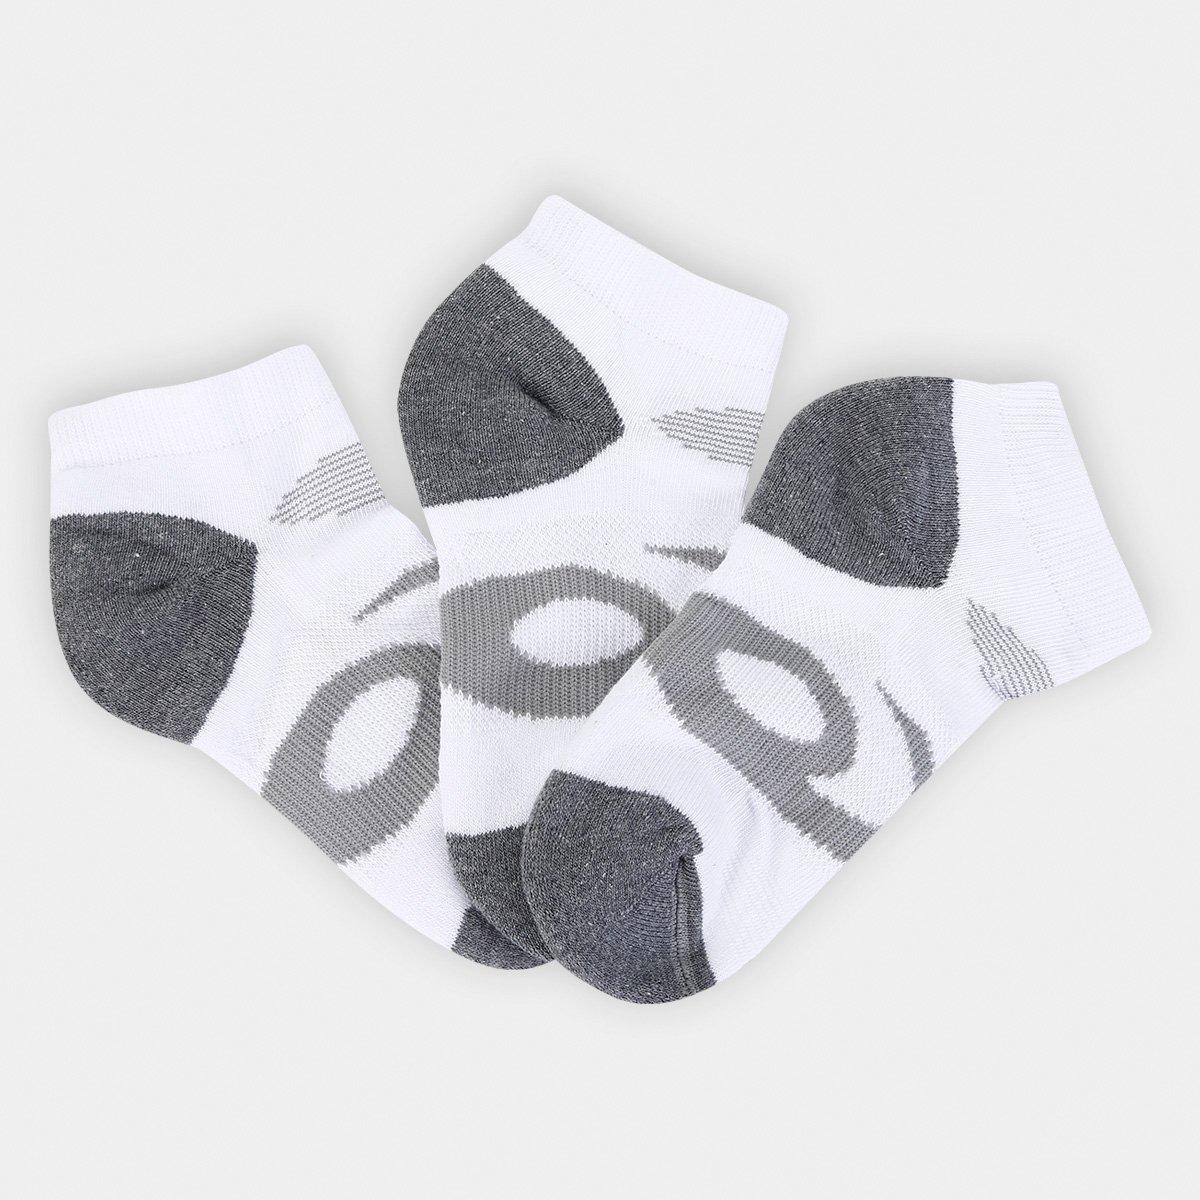 Kit Meia Infantil Asics Cano Curto Youth Quick Lyte Cushion Quarter 3 Pares